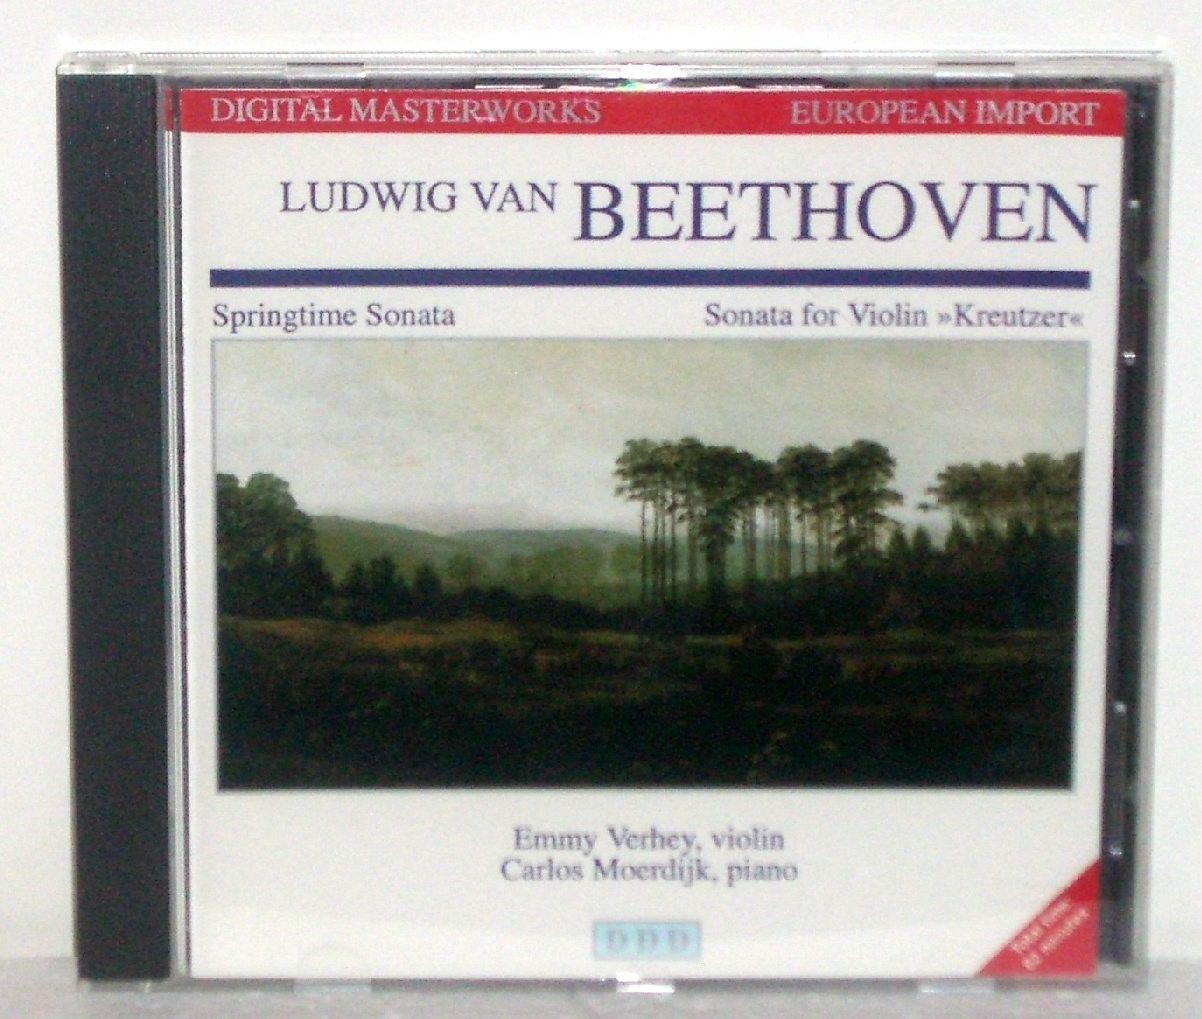 Beethoven: Springtime Sonata for Violin & Piano Moerdijk by Emmy Verhey CD